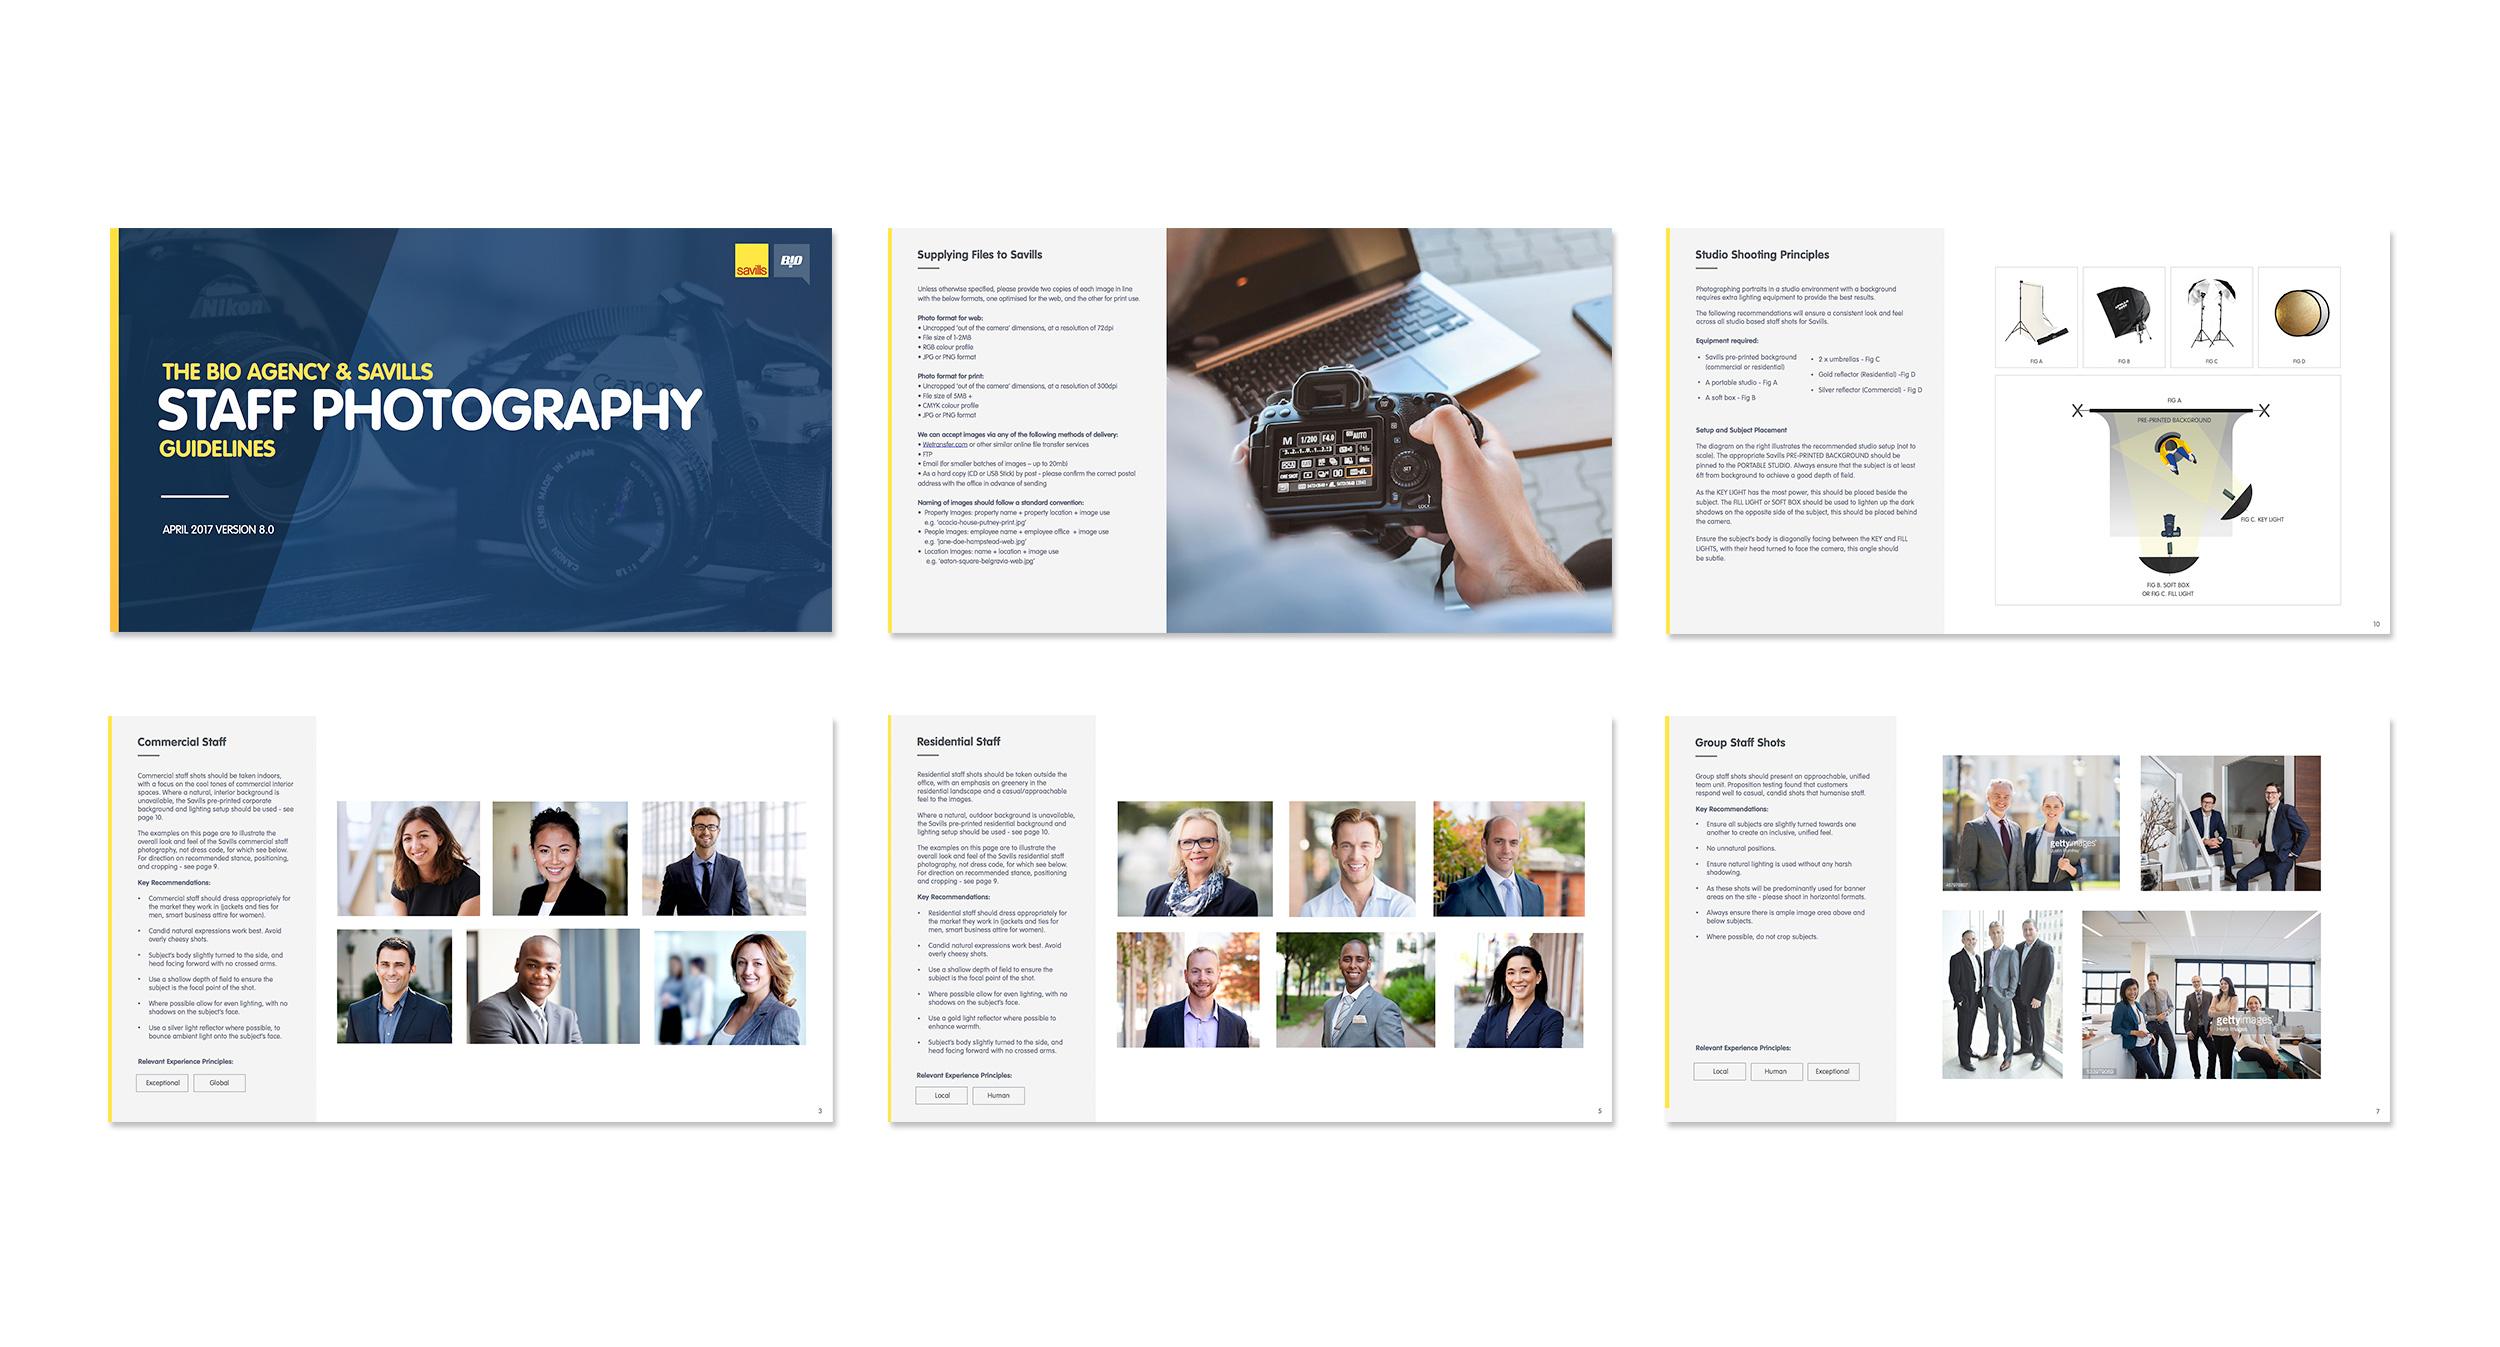 Photography-guide-savills_01.jpg